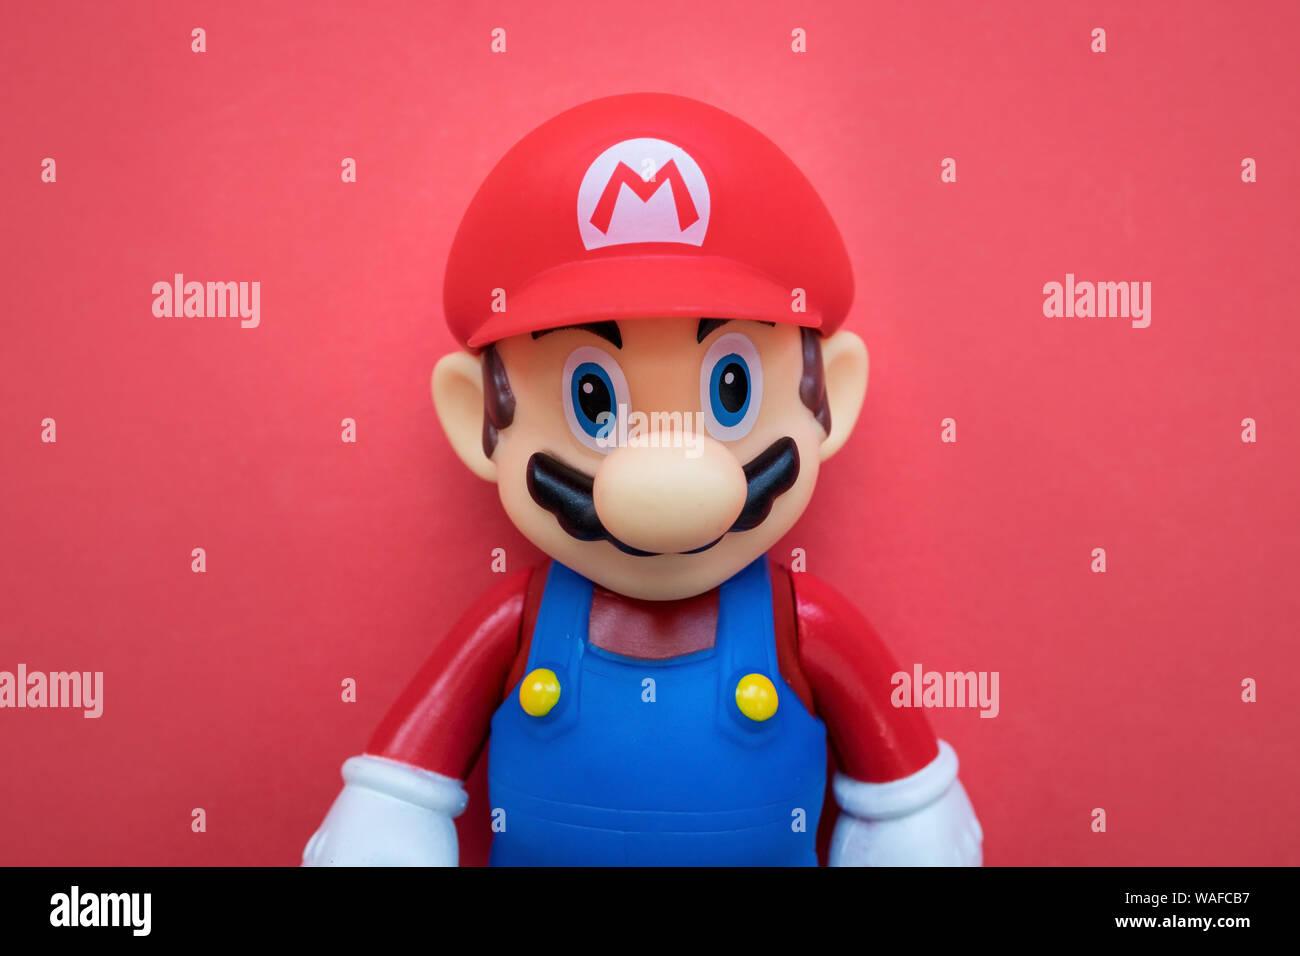 London July 31 2019 Super Mario Nintendo Video Game